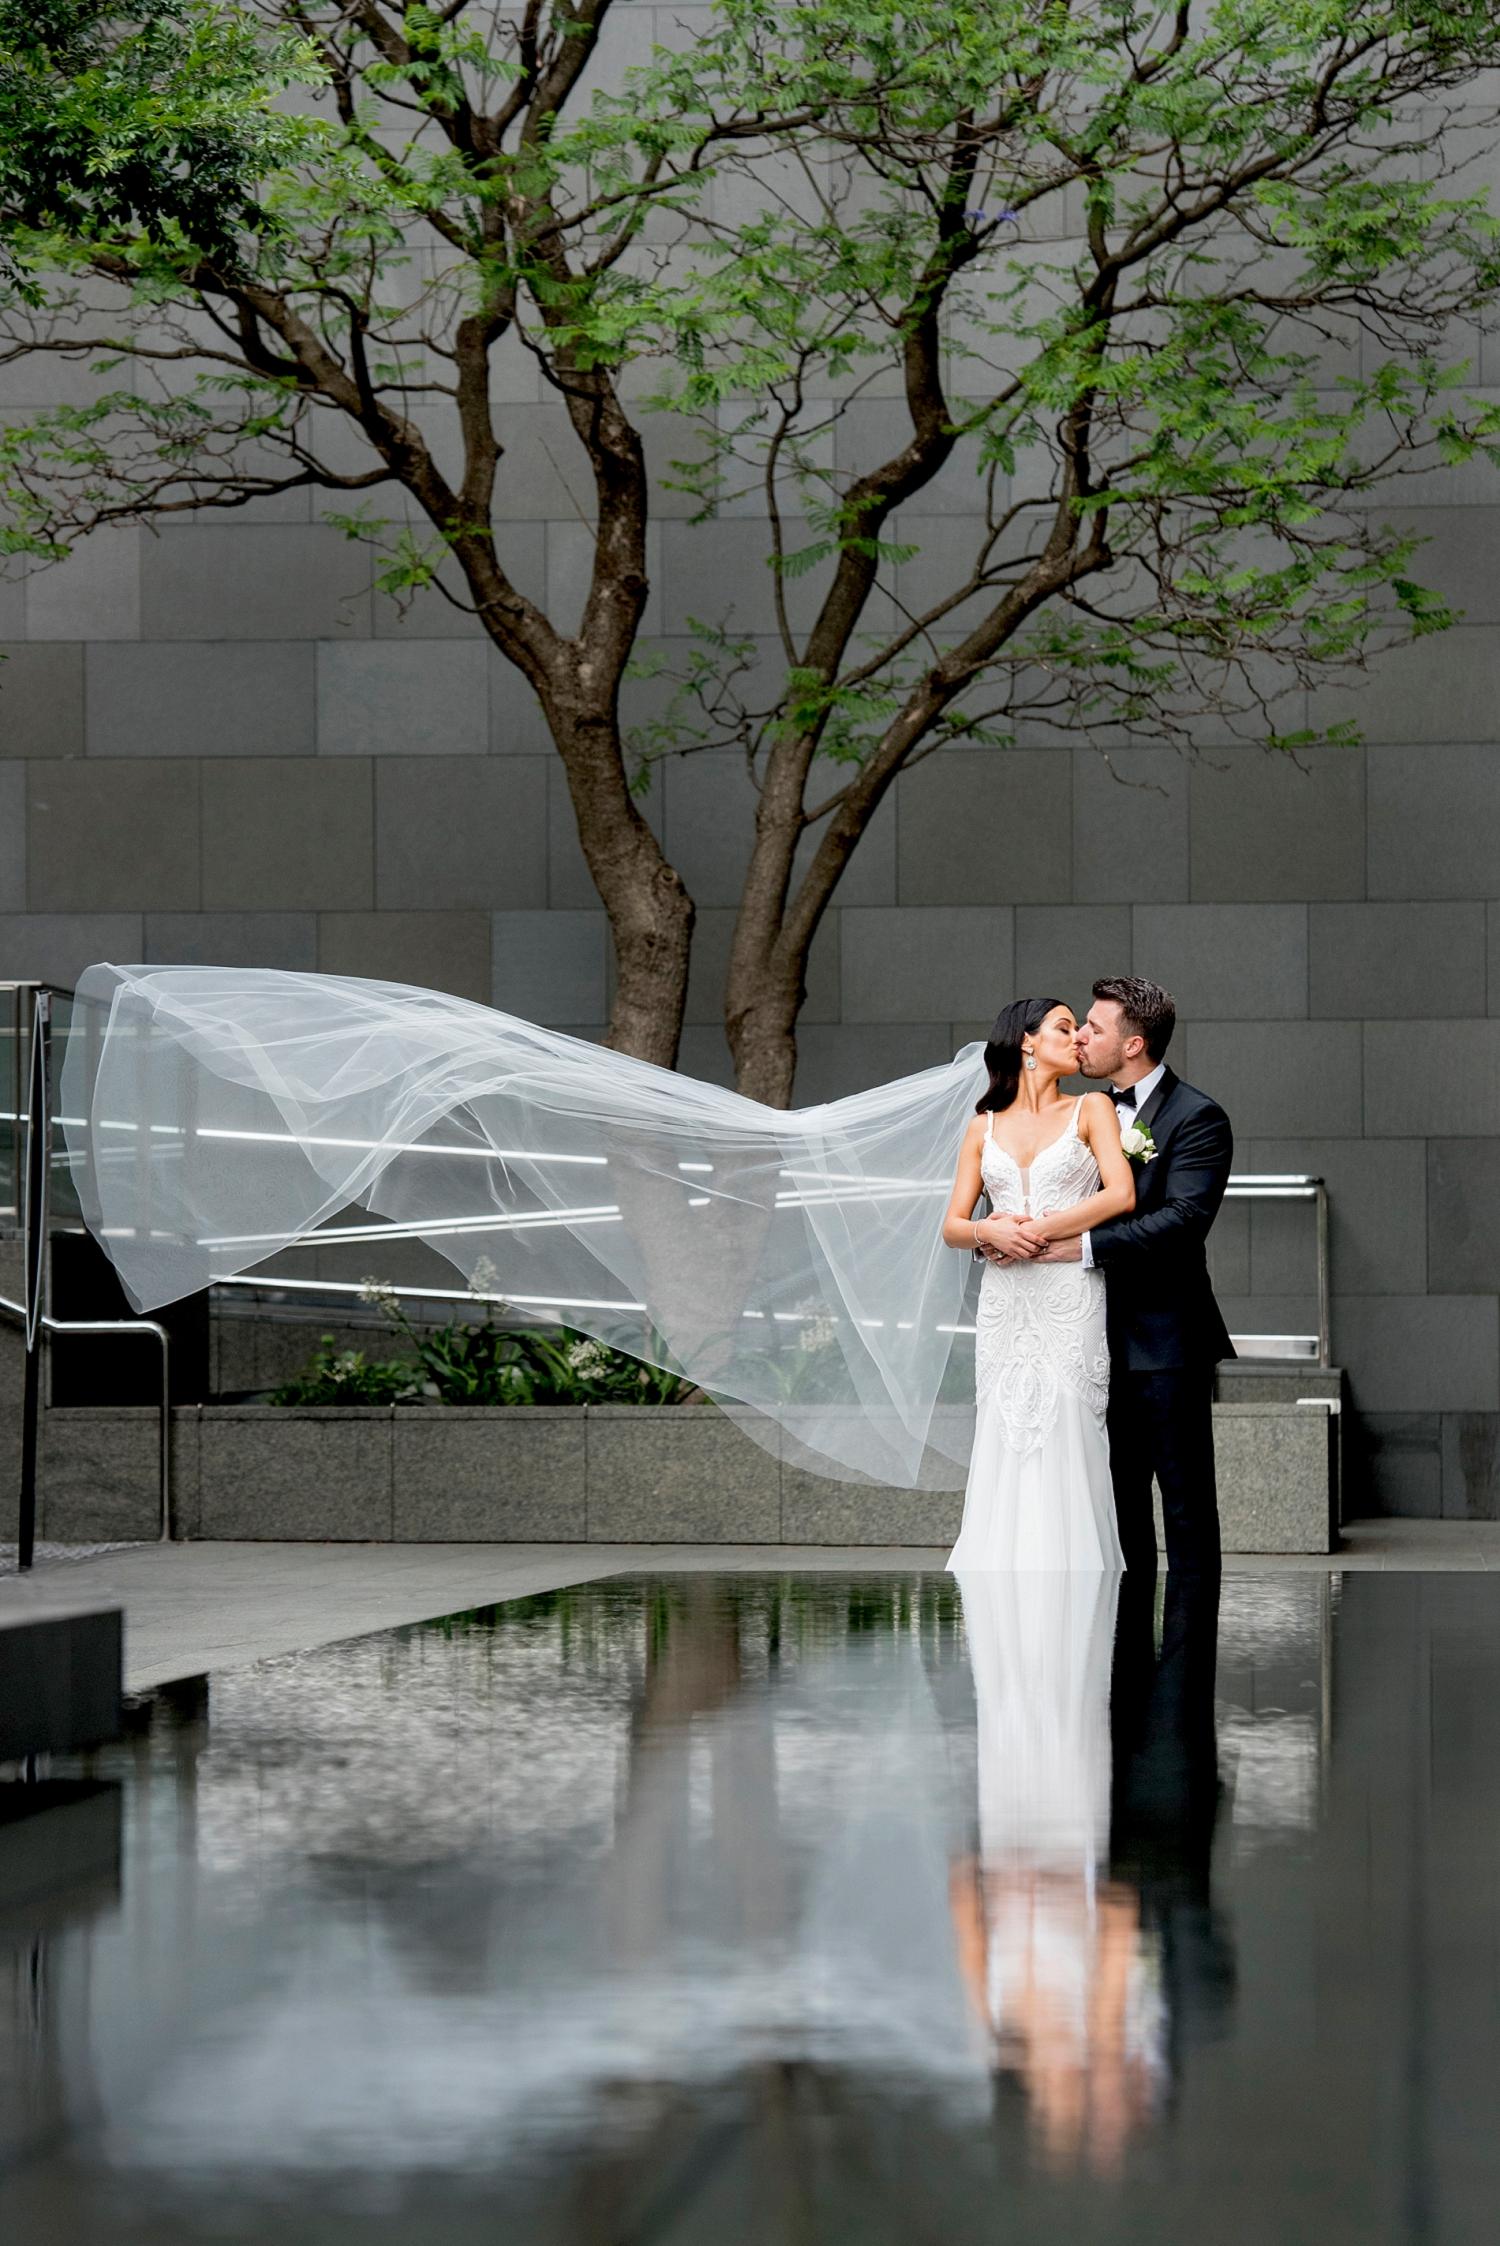 53_treasury buildings wedding perth.jpg